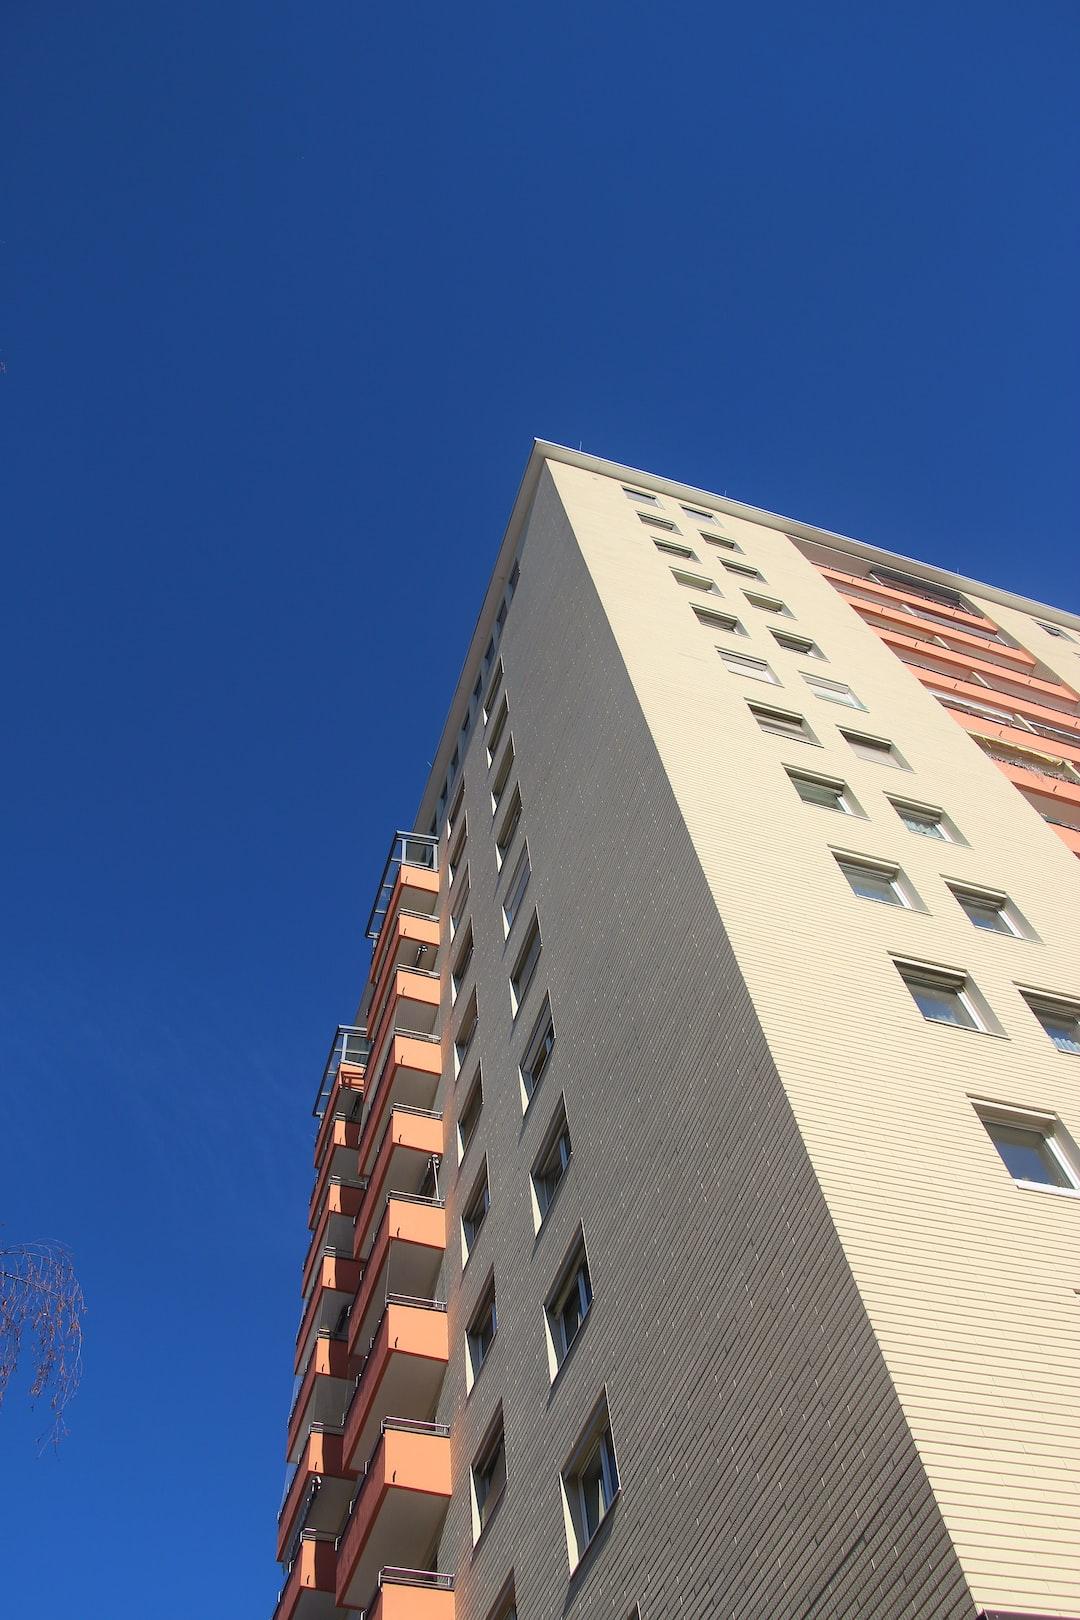 Block of flats in the suburbia. Salzburg city, district Lehen, Austria, Europe.